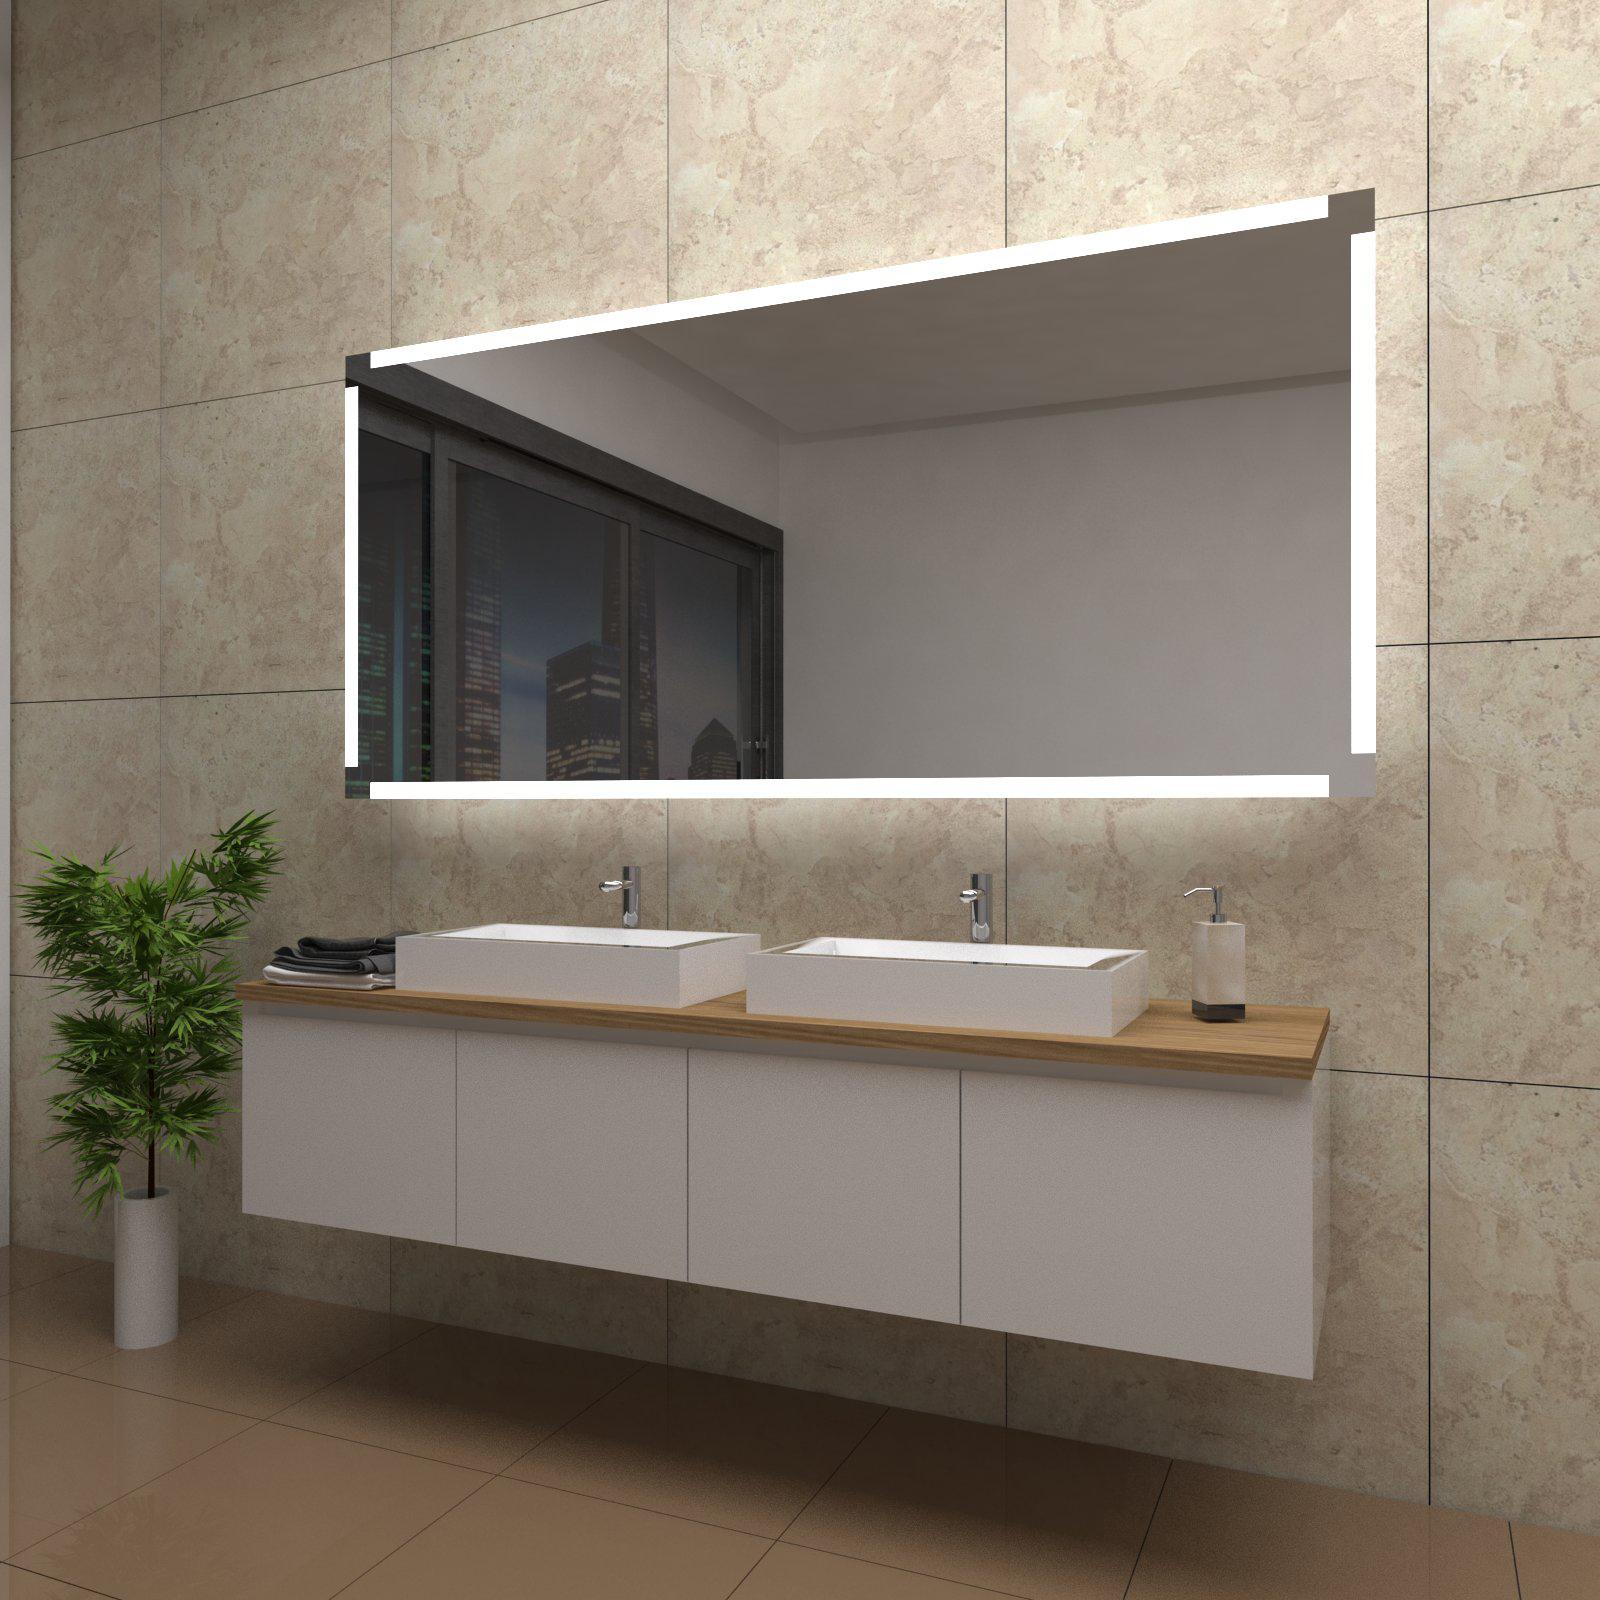 spiegelserie emily badspiegel nach serie. Black Bedroom Furniture Sets. Home Design Ideas